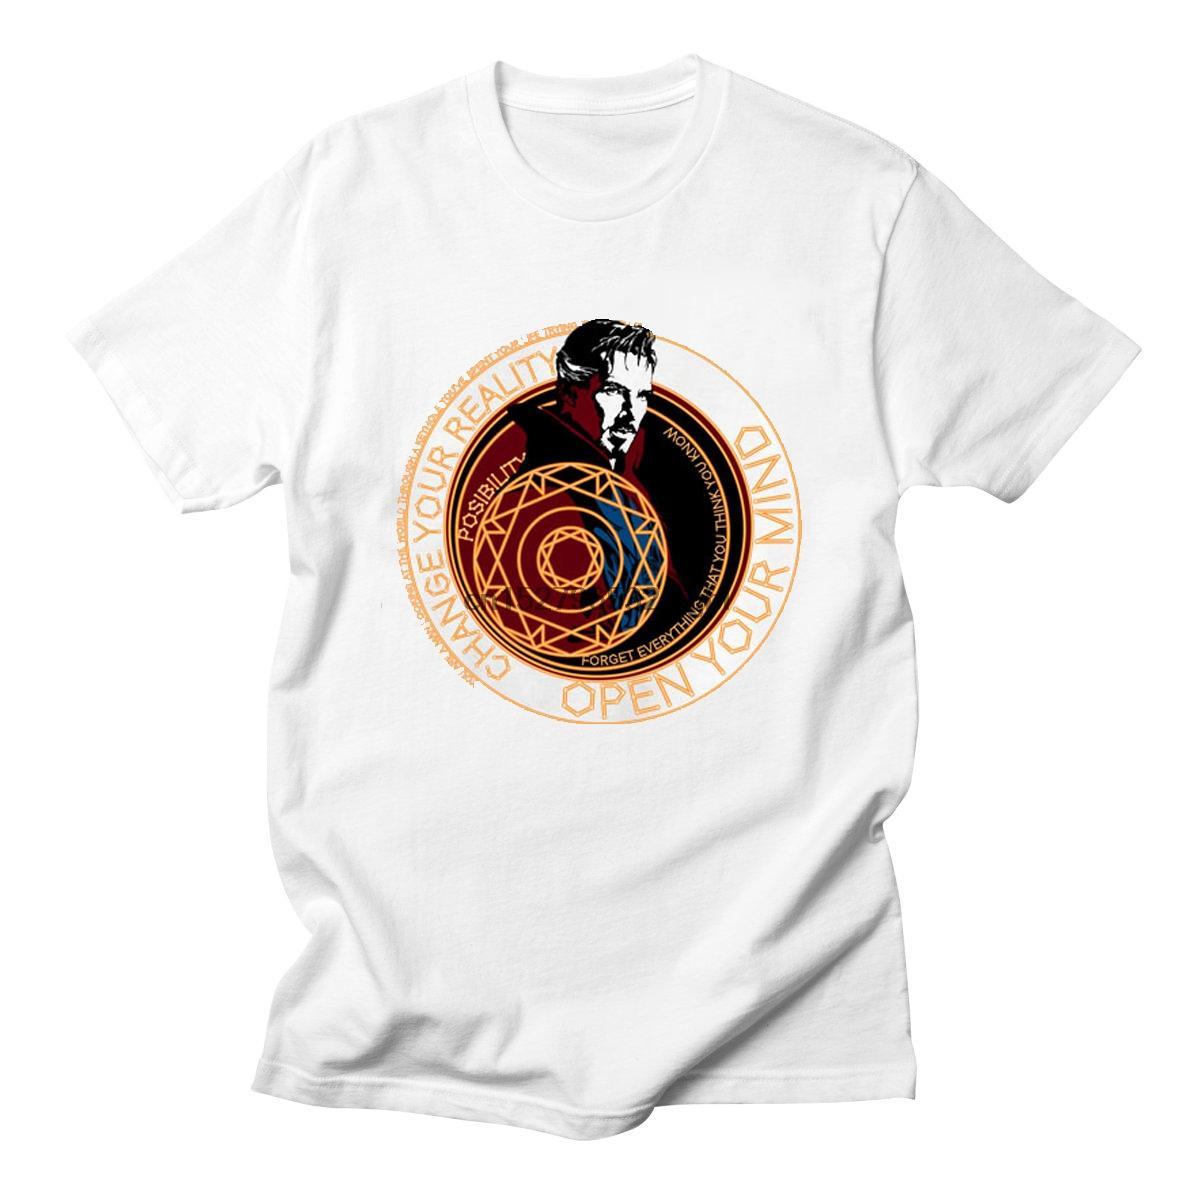 Dottor Strange Benedict Cumberbatch Uomini classici unisex T T-shirt Film Dr Strano Superheroes magliette Top Tee